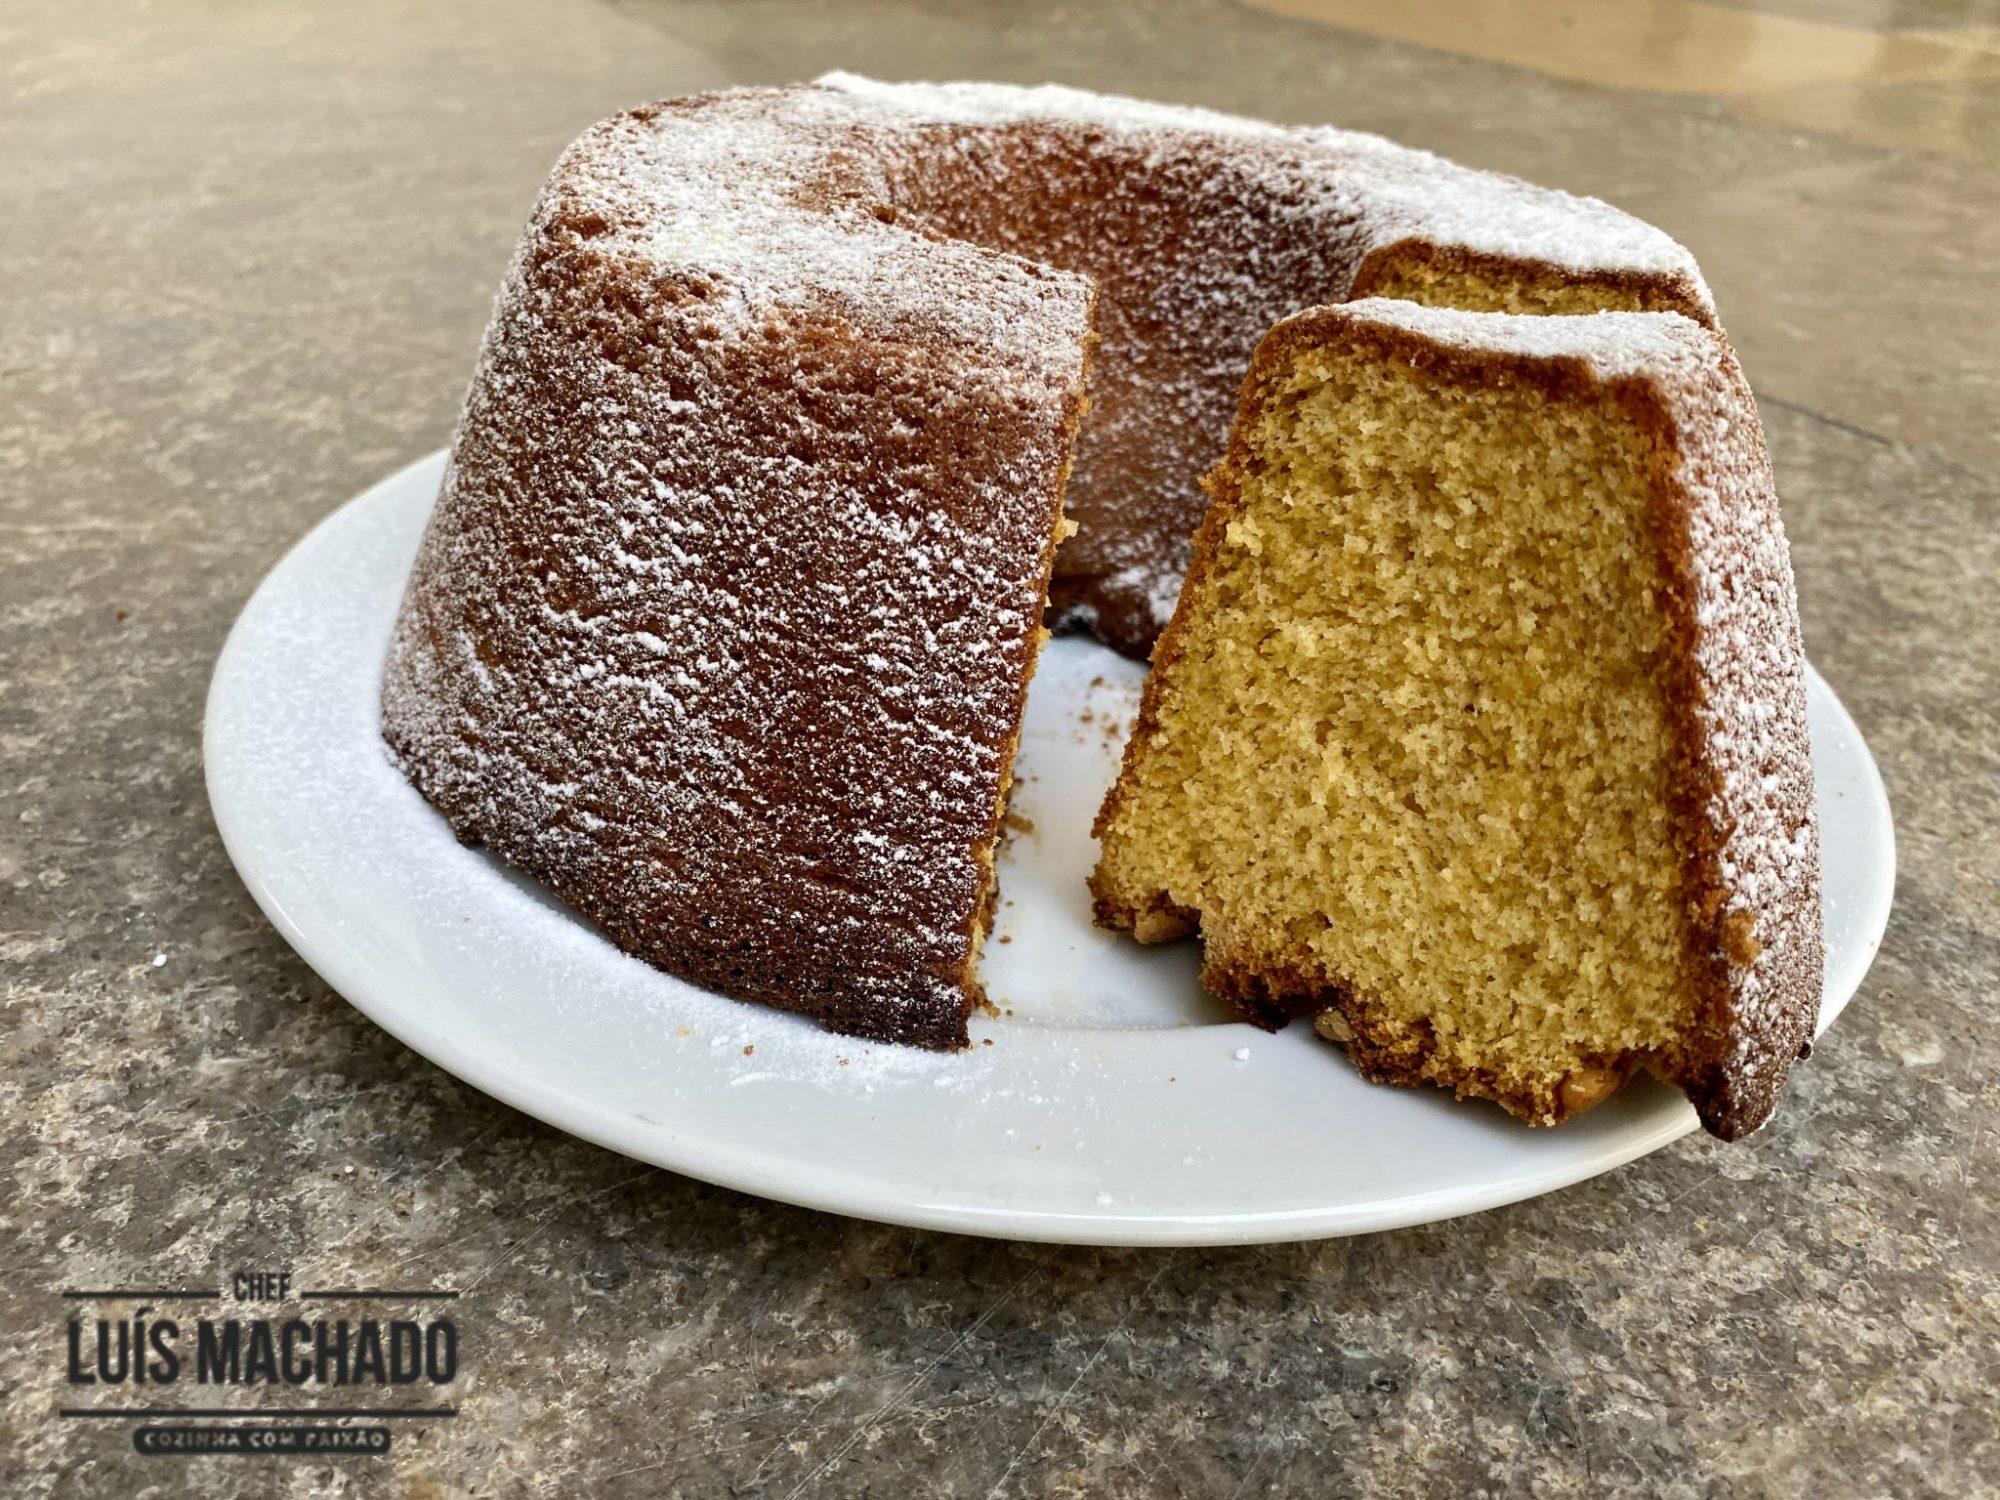 bolo de açúcar amarelo